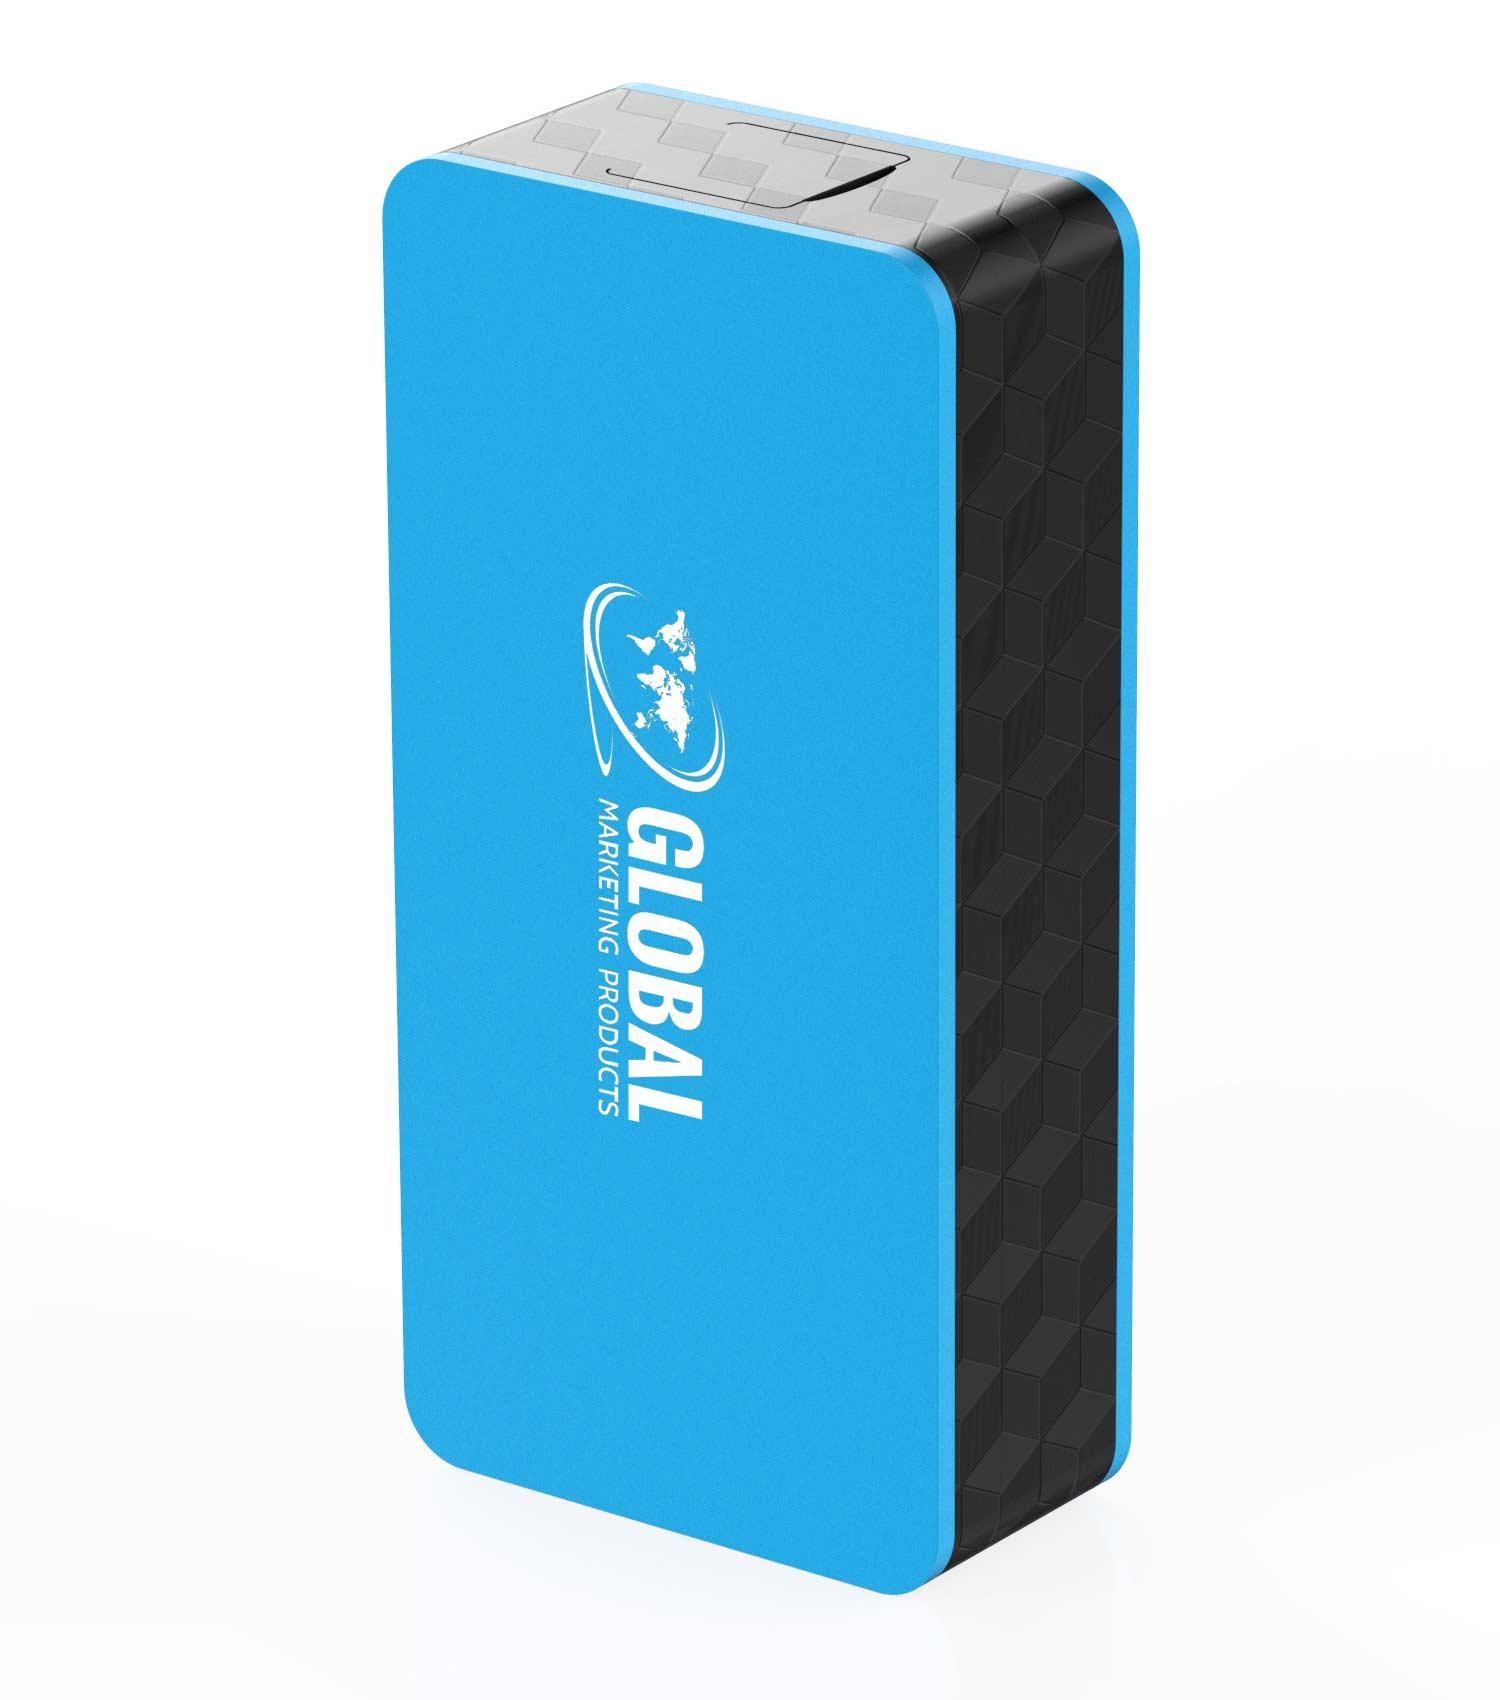 power_bank_1803_blue